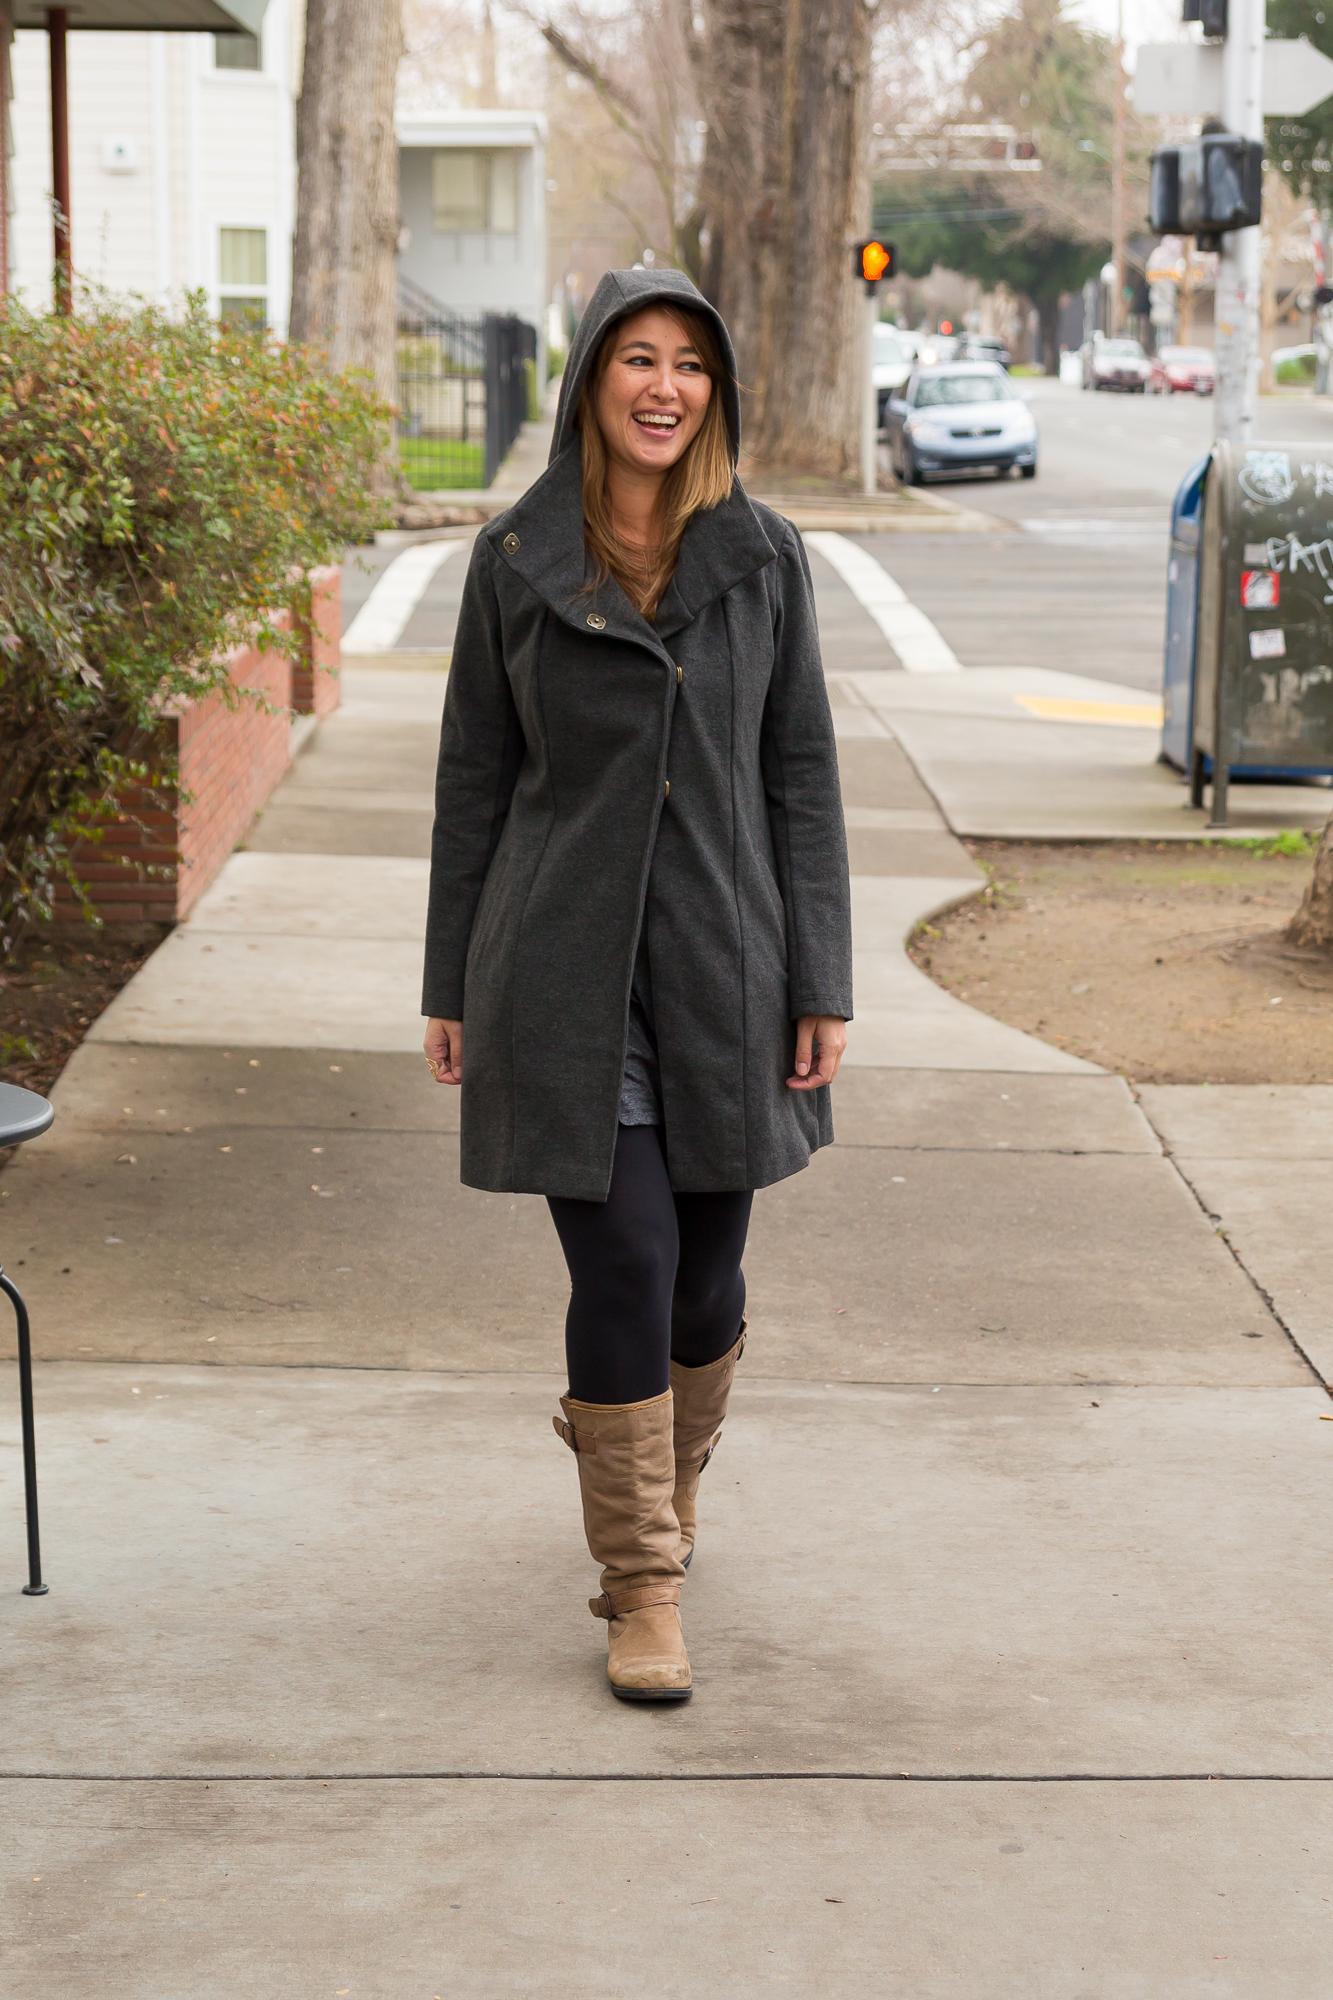 Melissa Fleis' All Day Coat